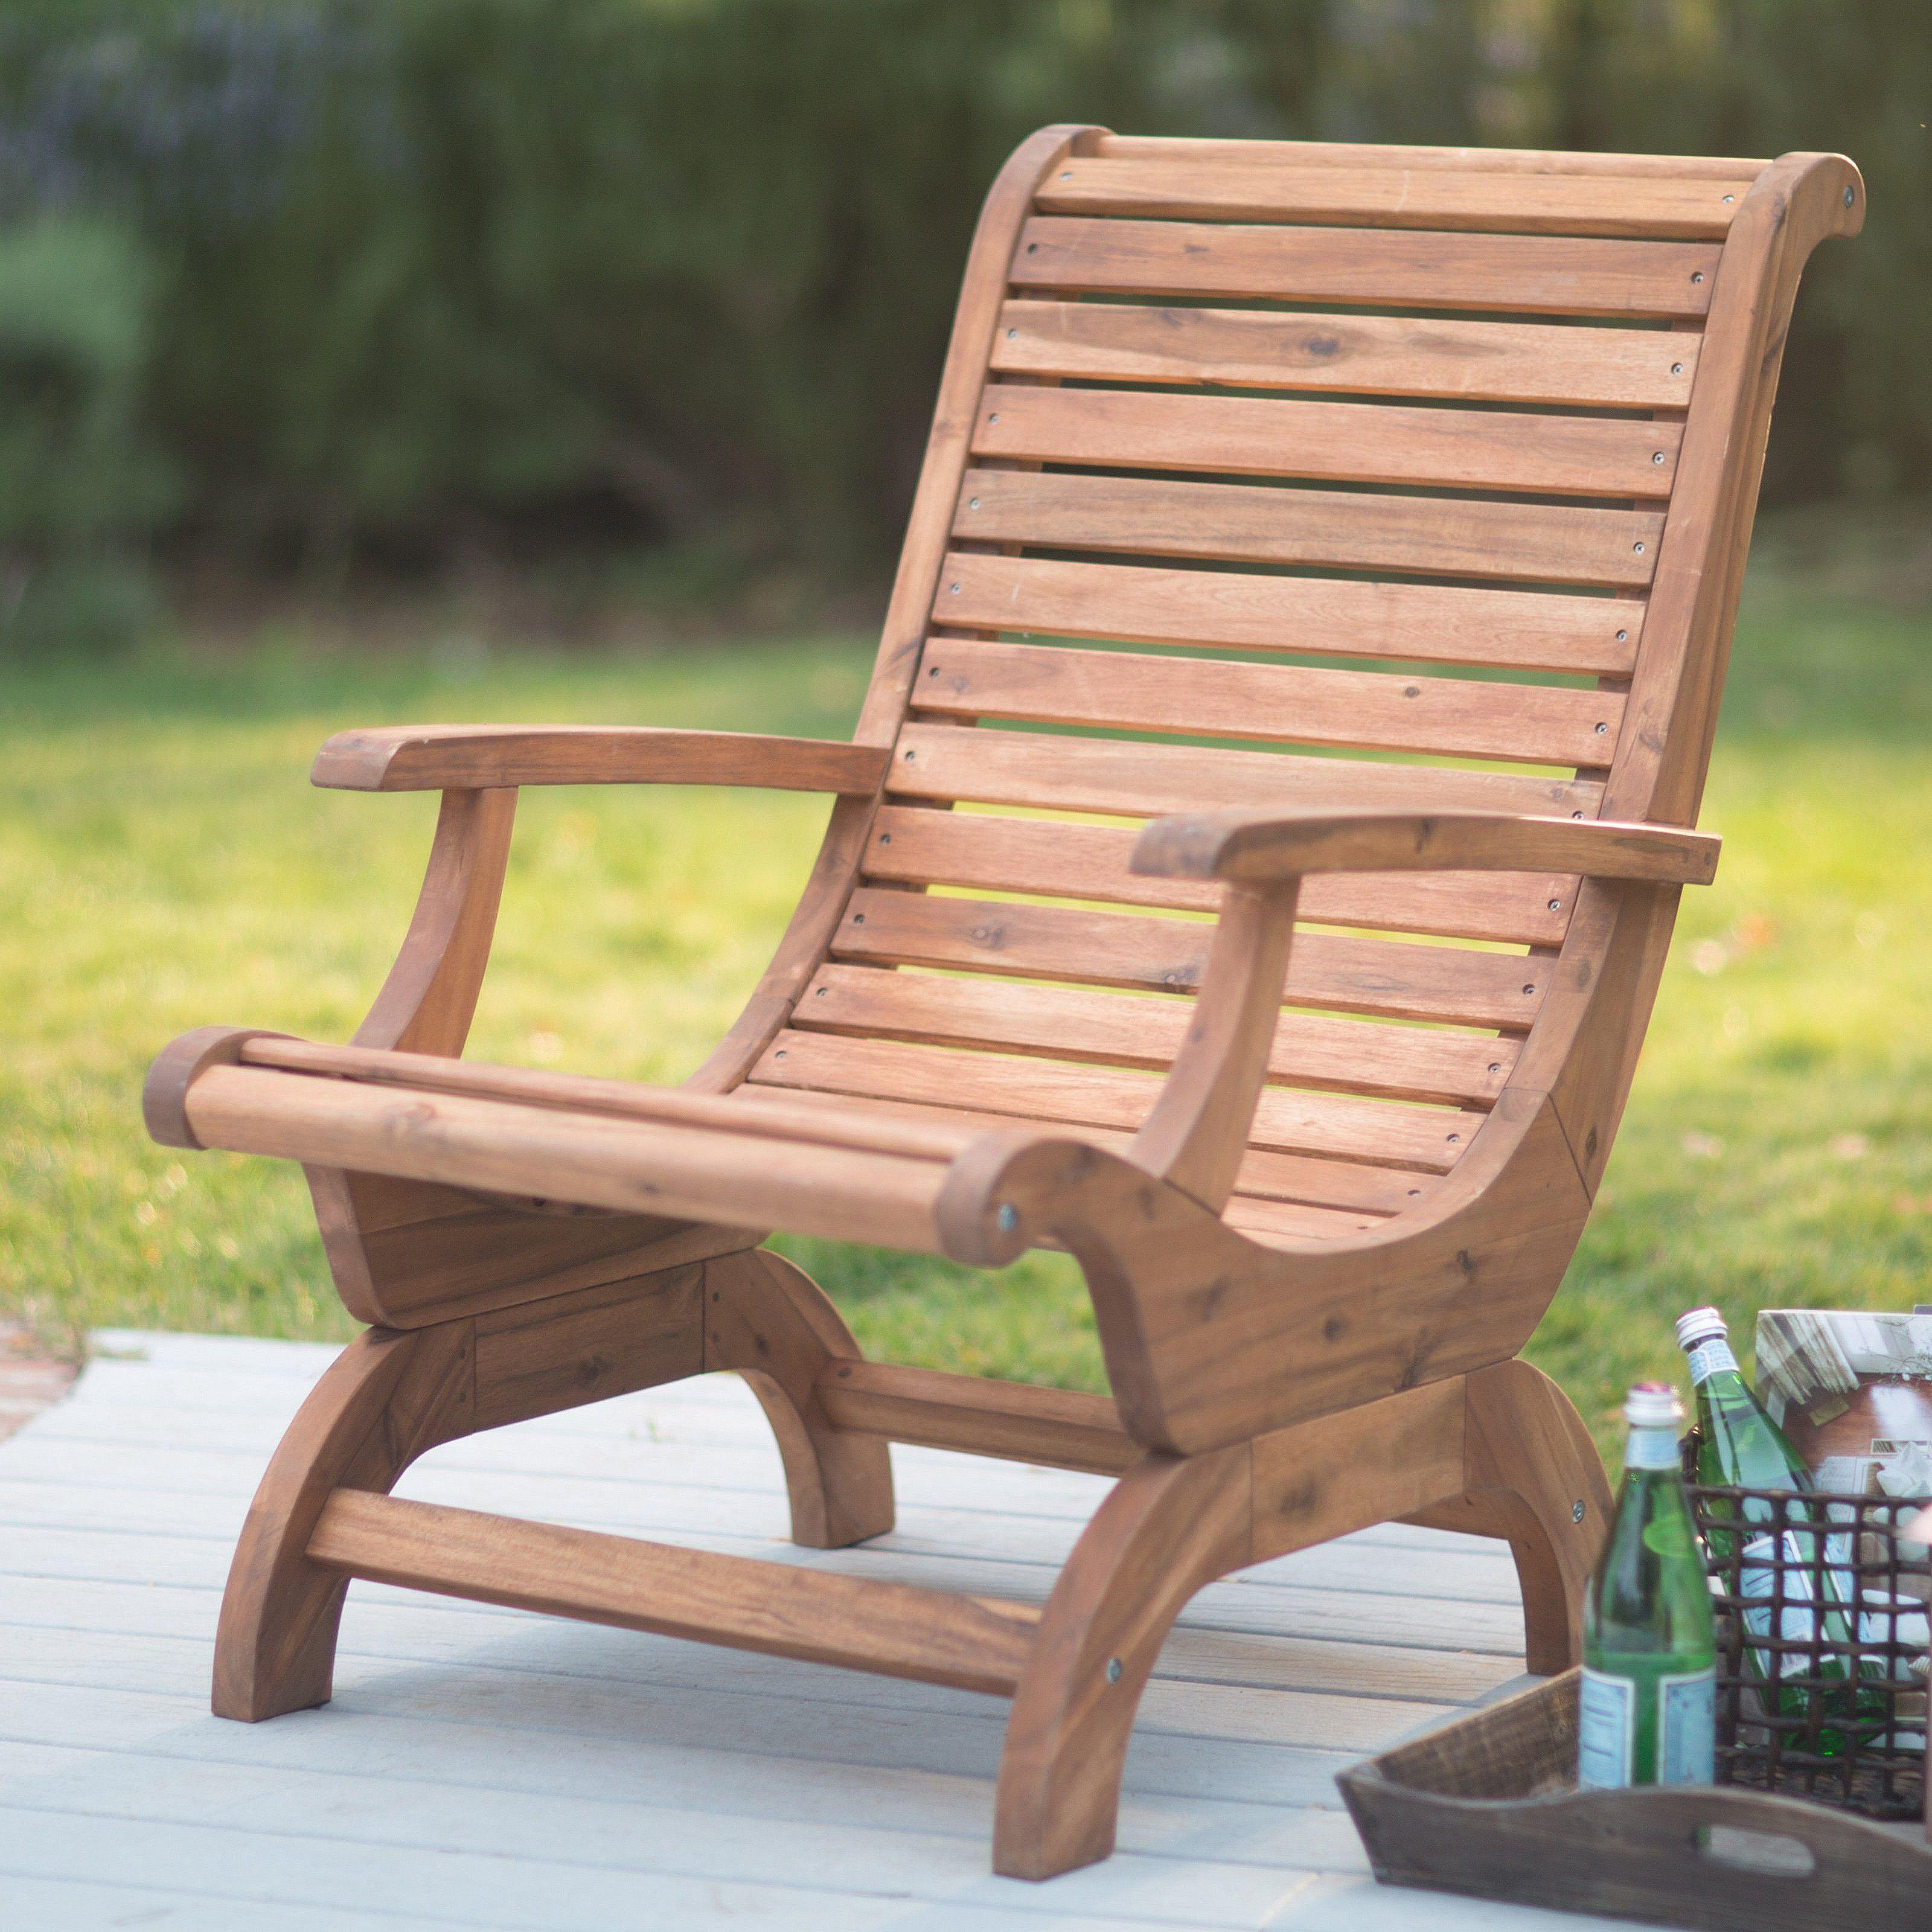 Kunststoff Deck Stühle Adirondack Kissen Recycling